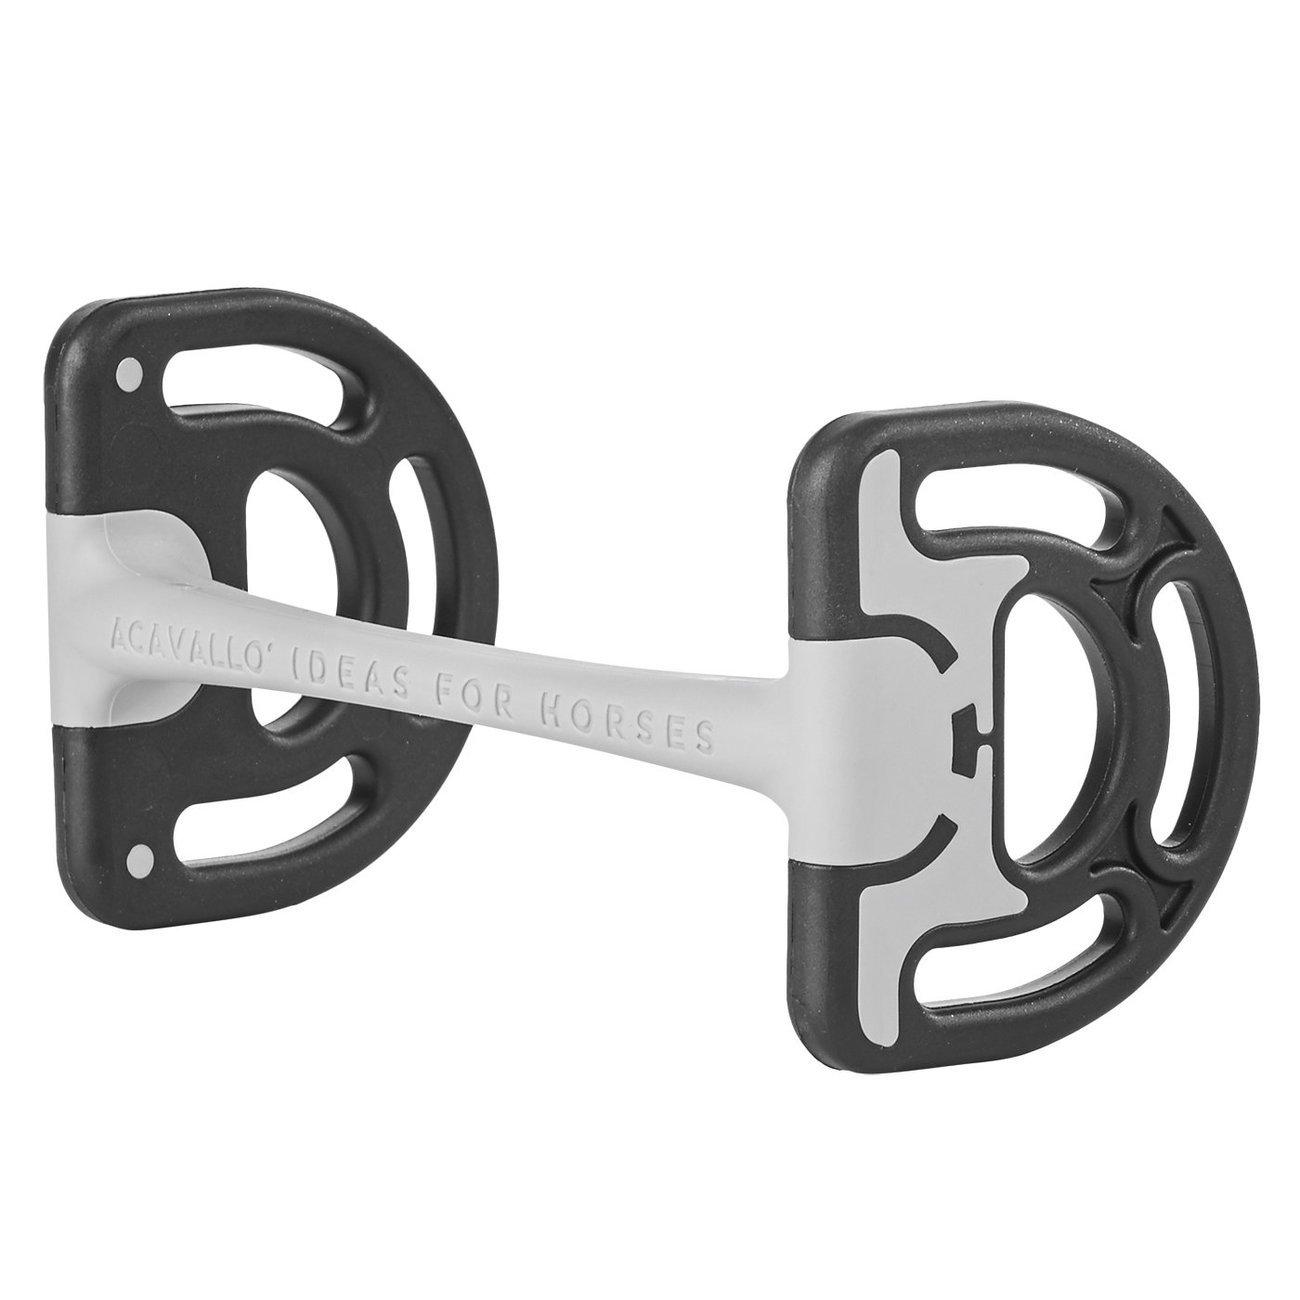 BUSSE Stangengebiss Sensitive, Gr. 12,5 cm, Stärke 17 mm - schwarz/grau